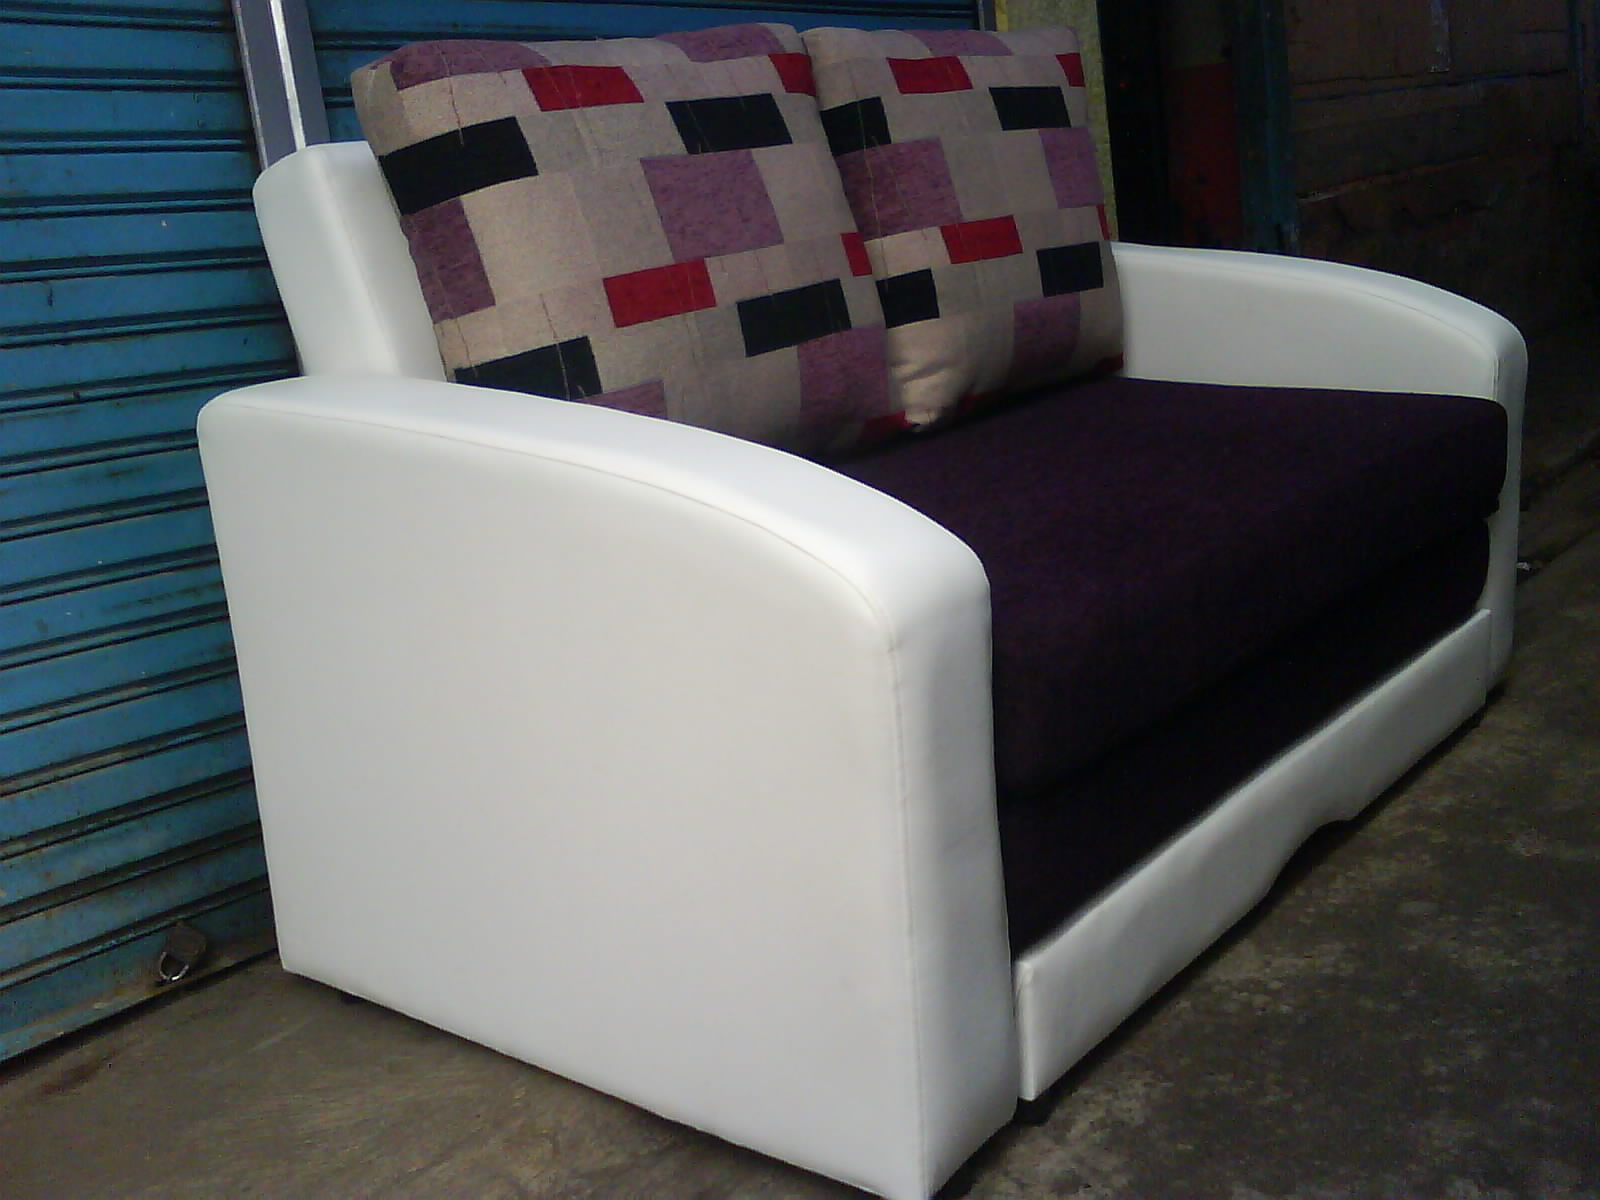 Cj Sofa Bandung Sofa Bed By Cj